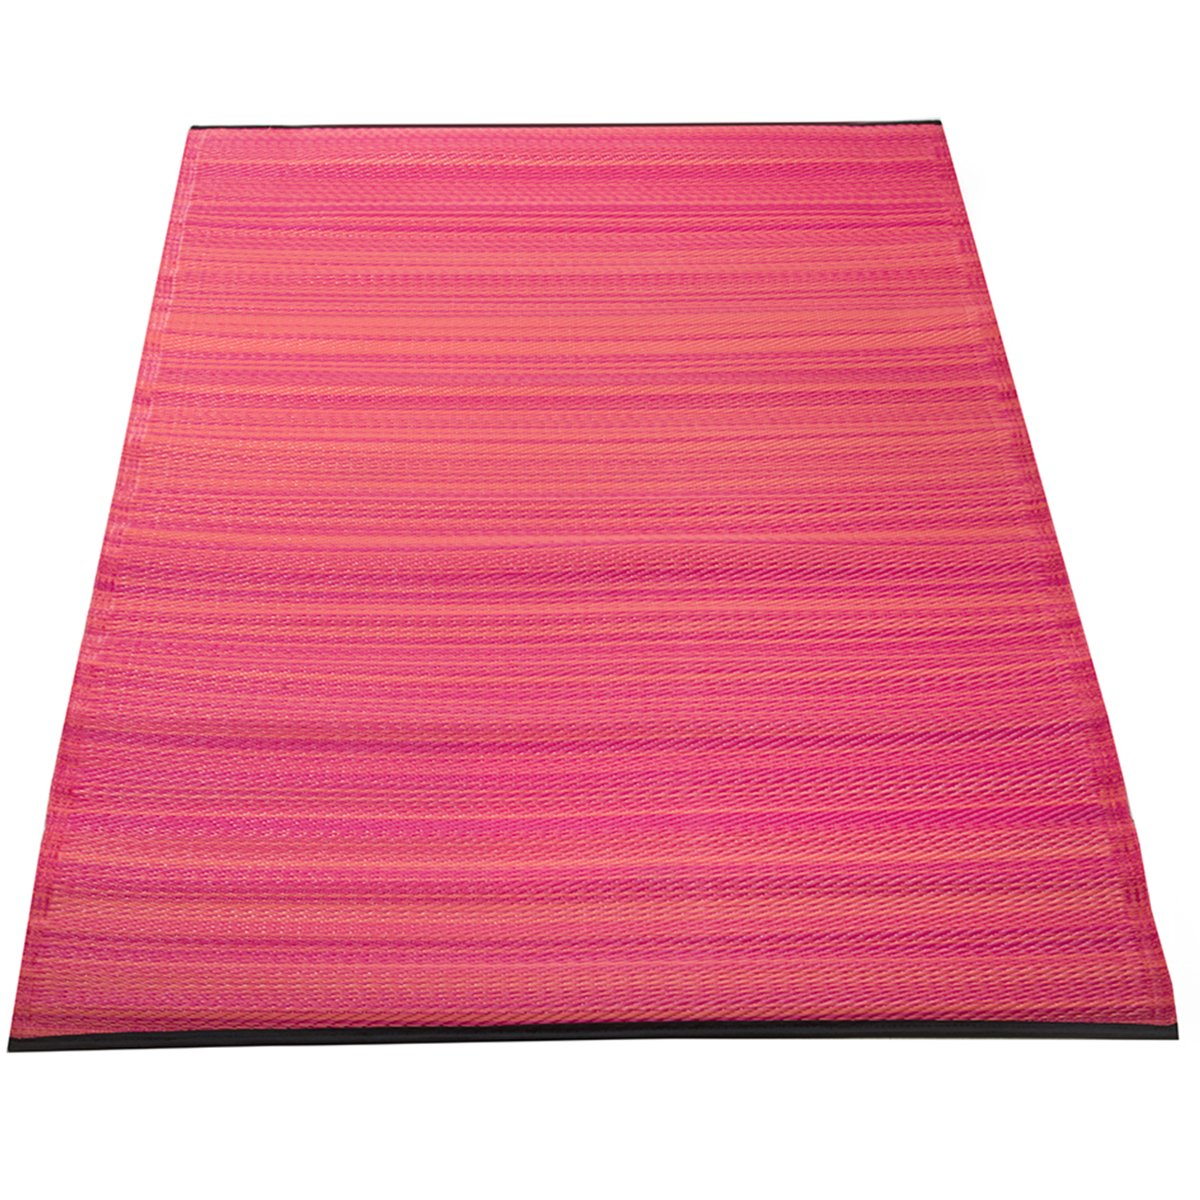 Yankee Trader 4' X 6' Indoor/Outdoor Decorative Reversible Patio Carpet Rug, Pattern 11